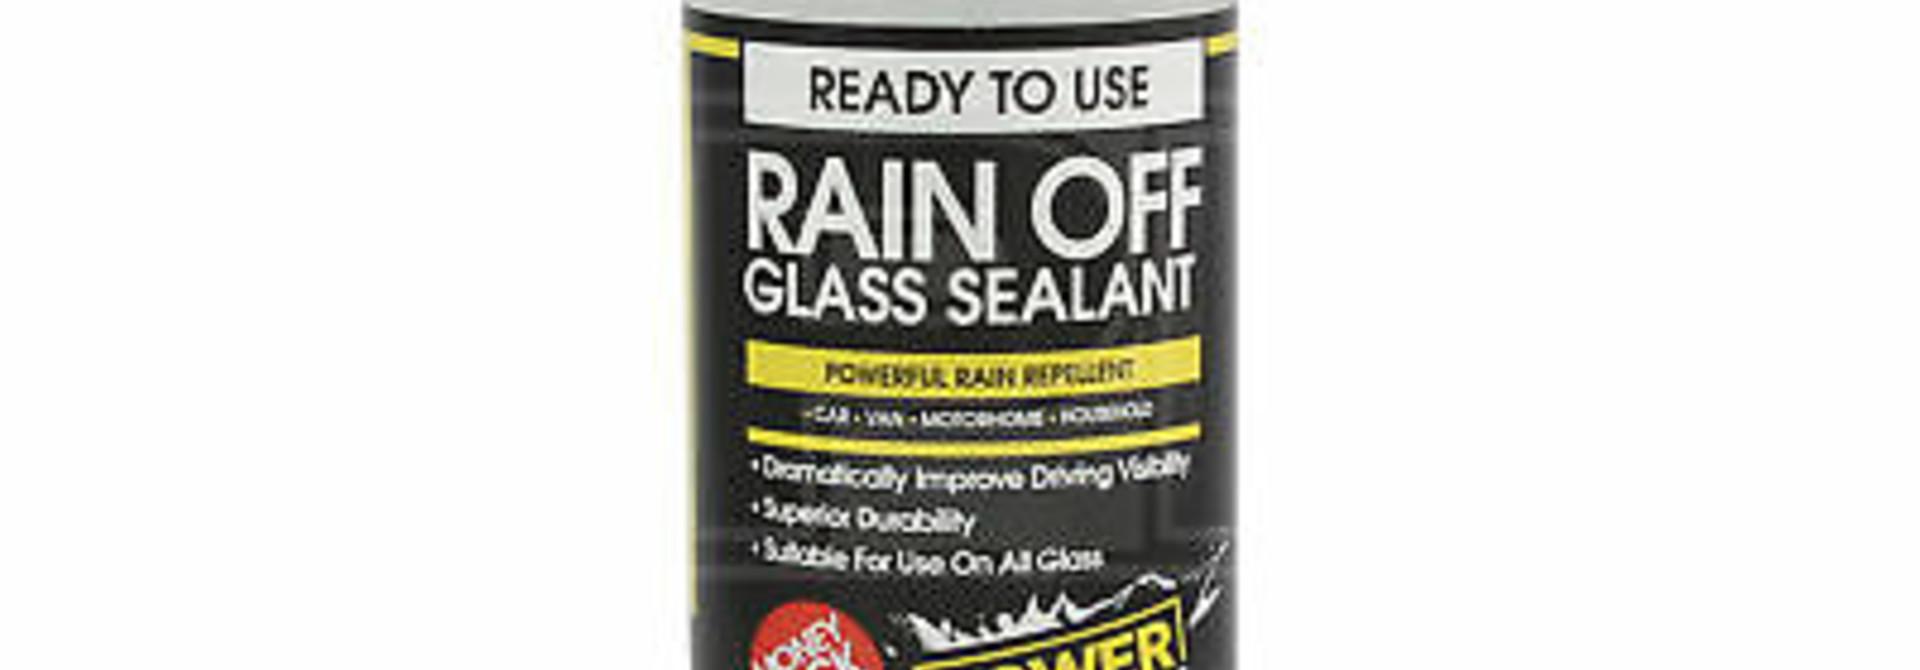 Rain Off Glass Sealant